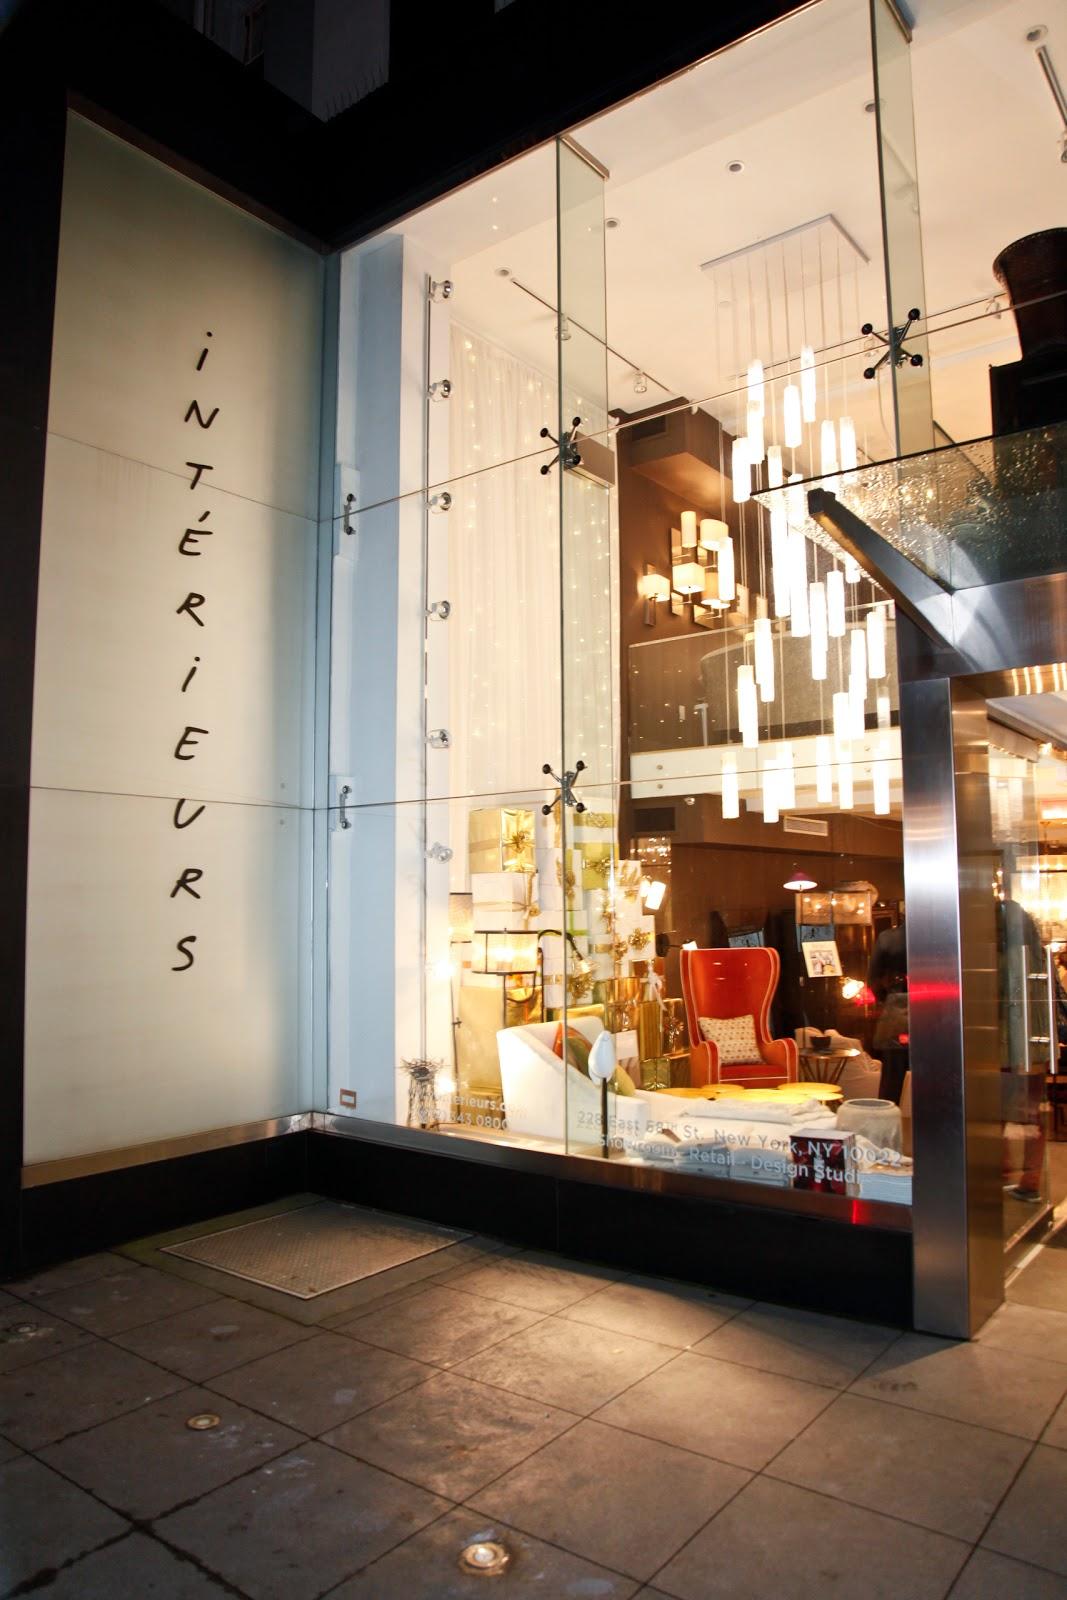 Francine Gardner - Art de Vivre: Celebrating Interieurs